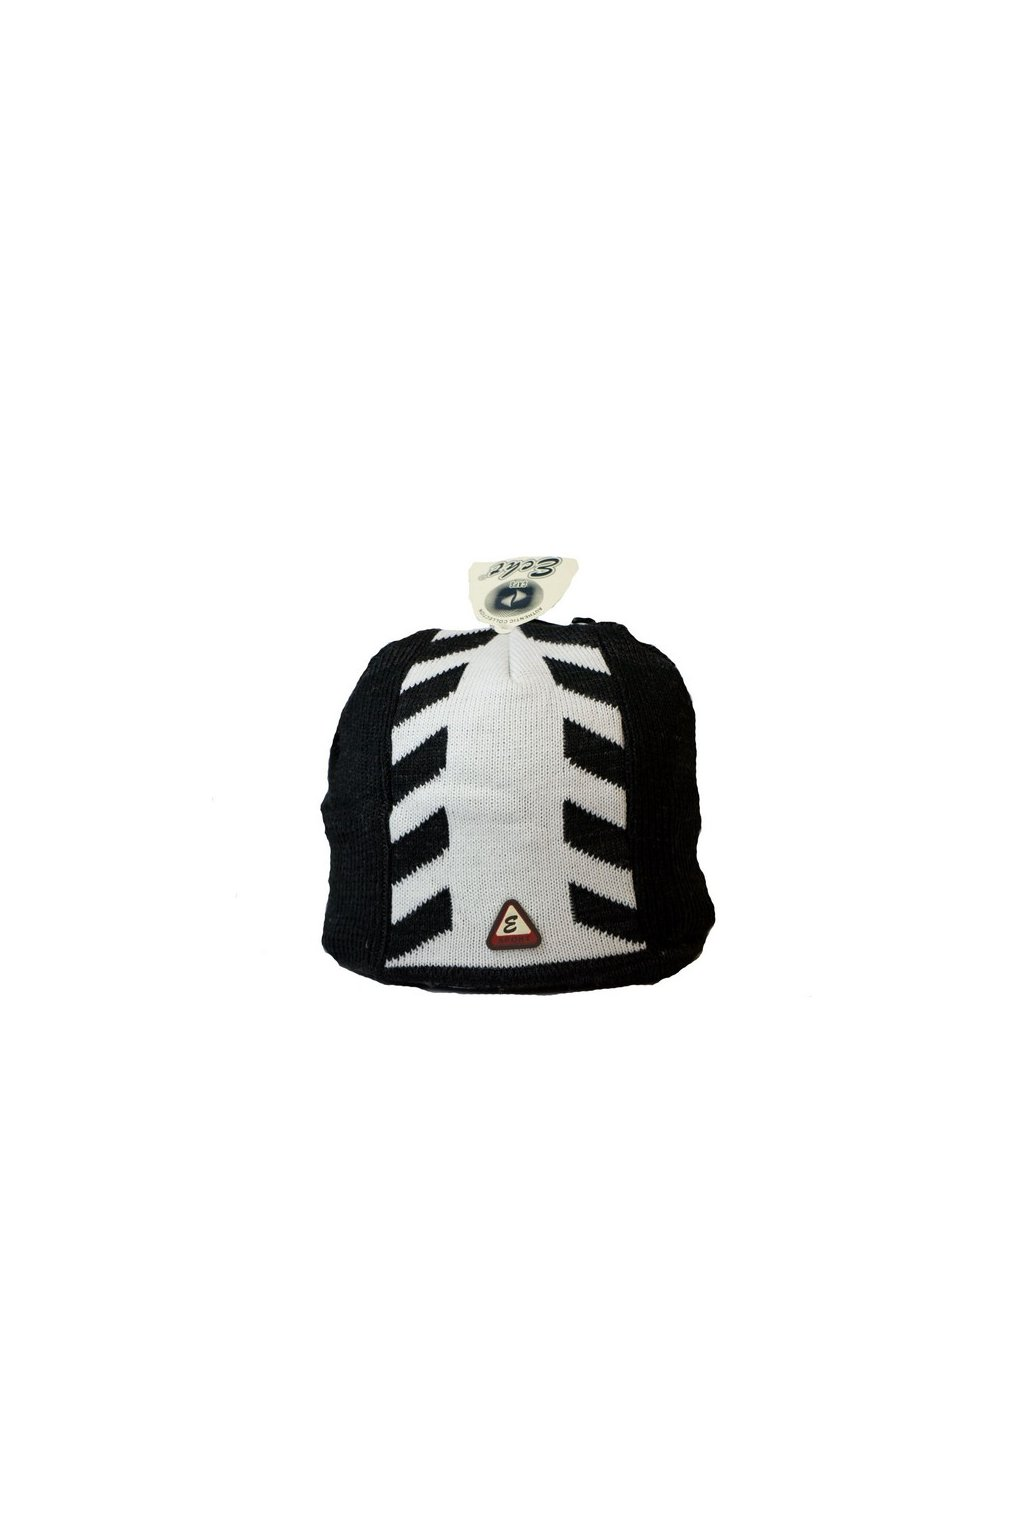 Pánská čepice F062 černo-bílá